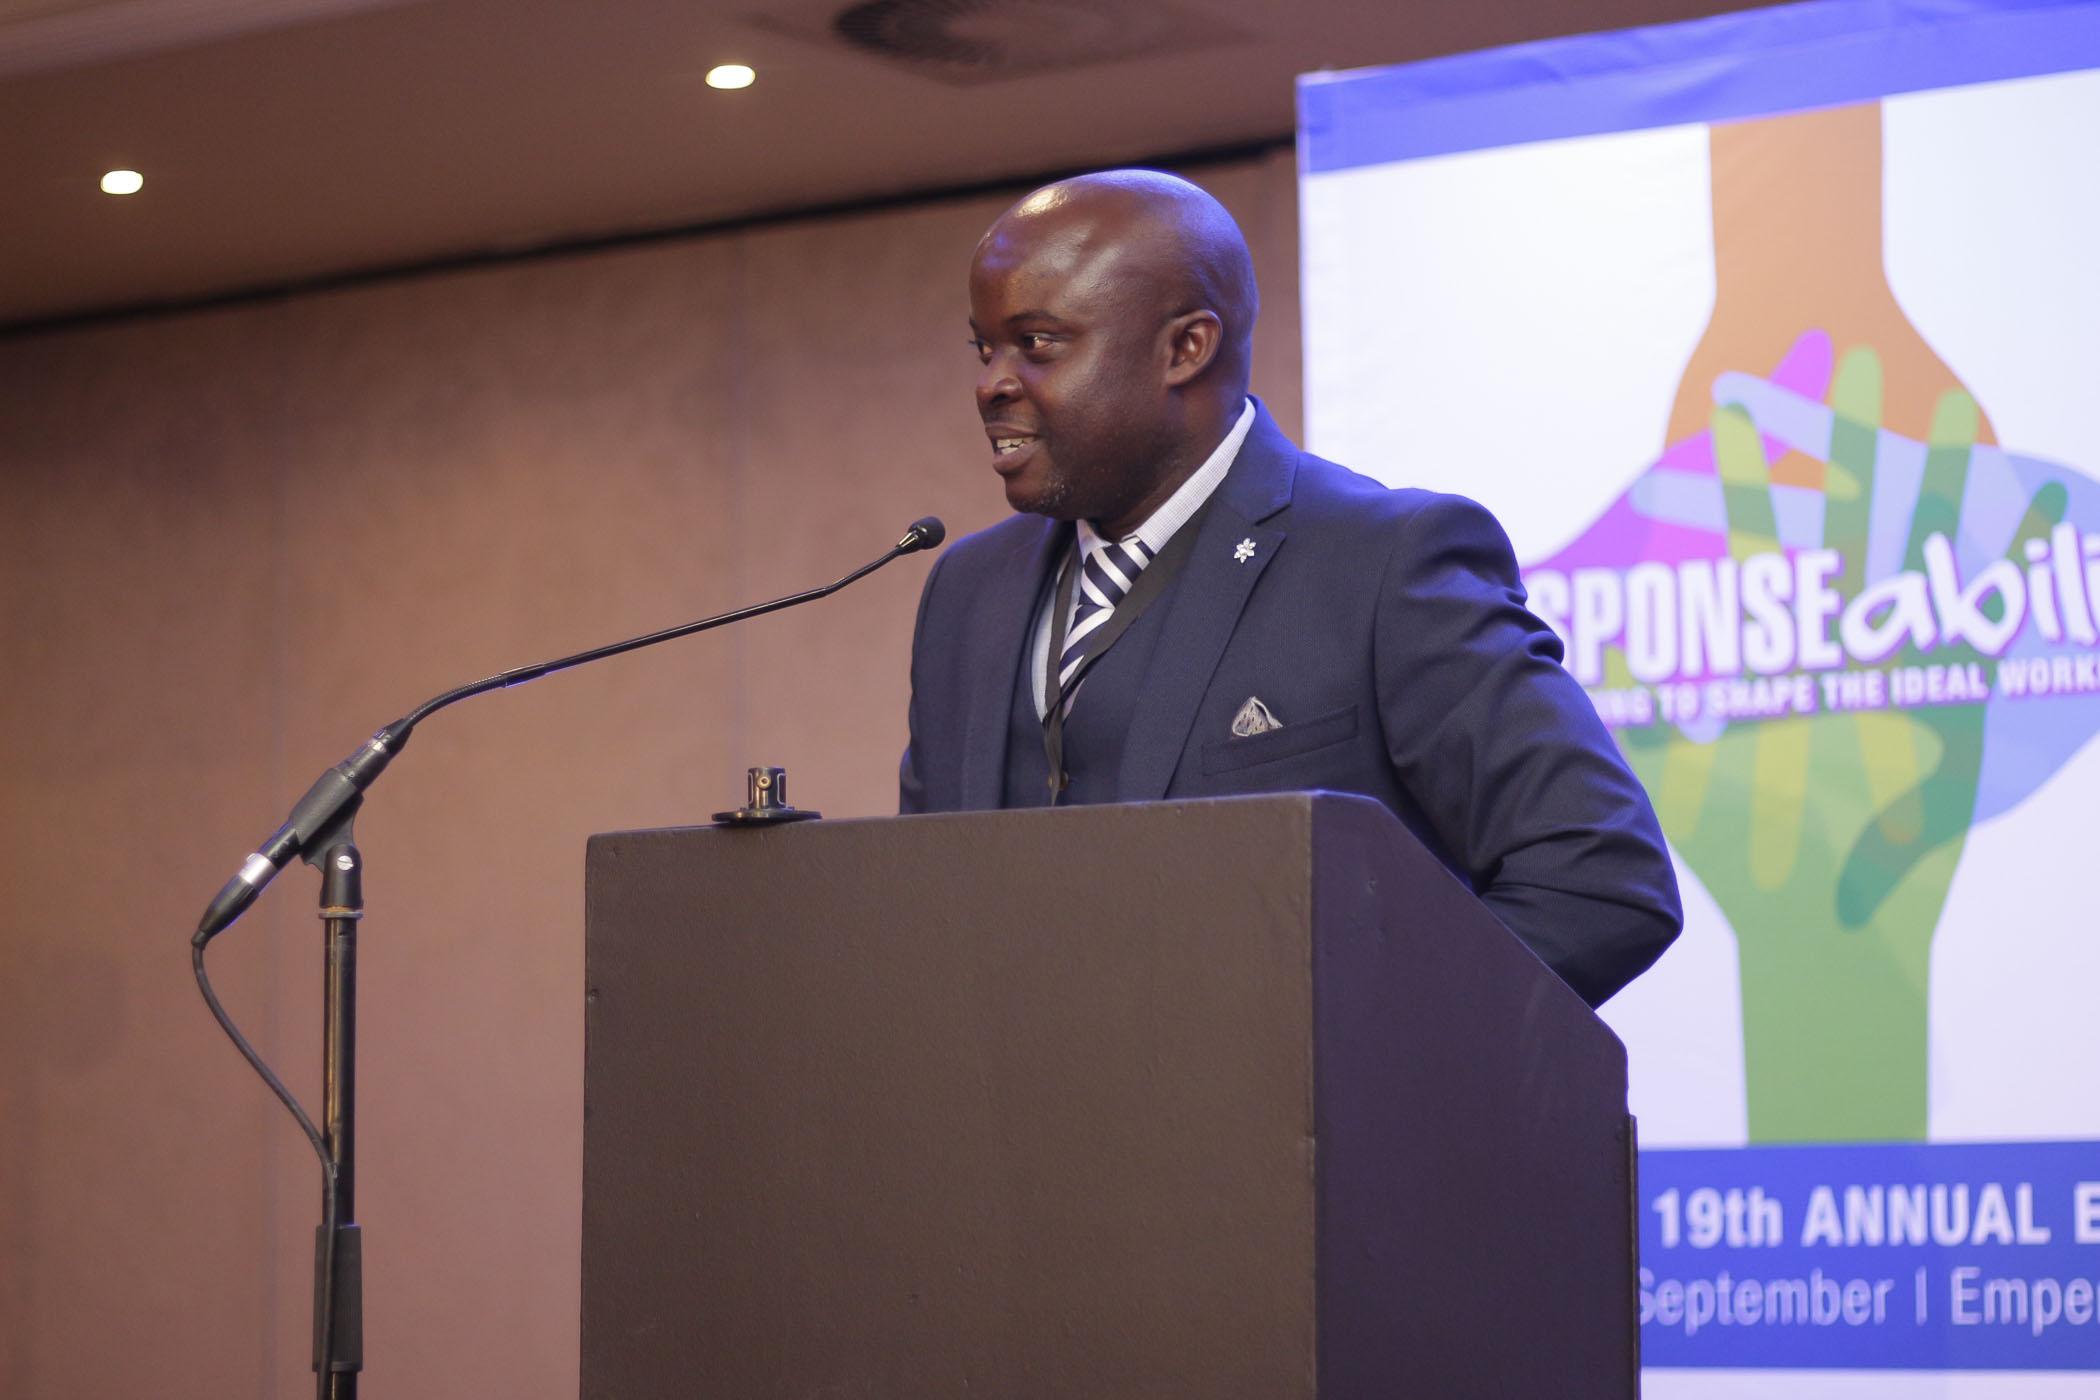 Mr. Tinyiko Godfrey Chabalala 2017